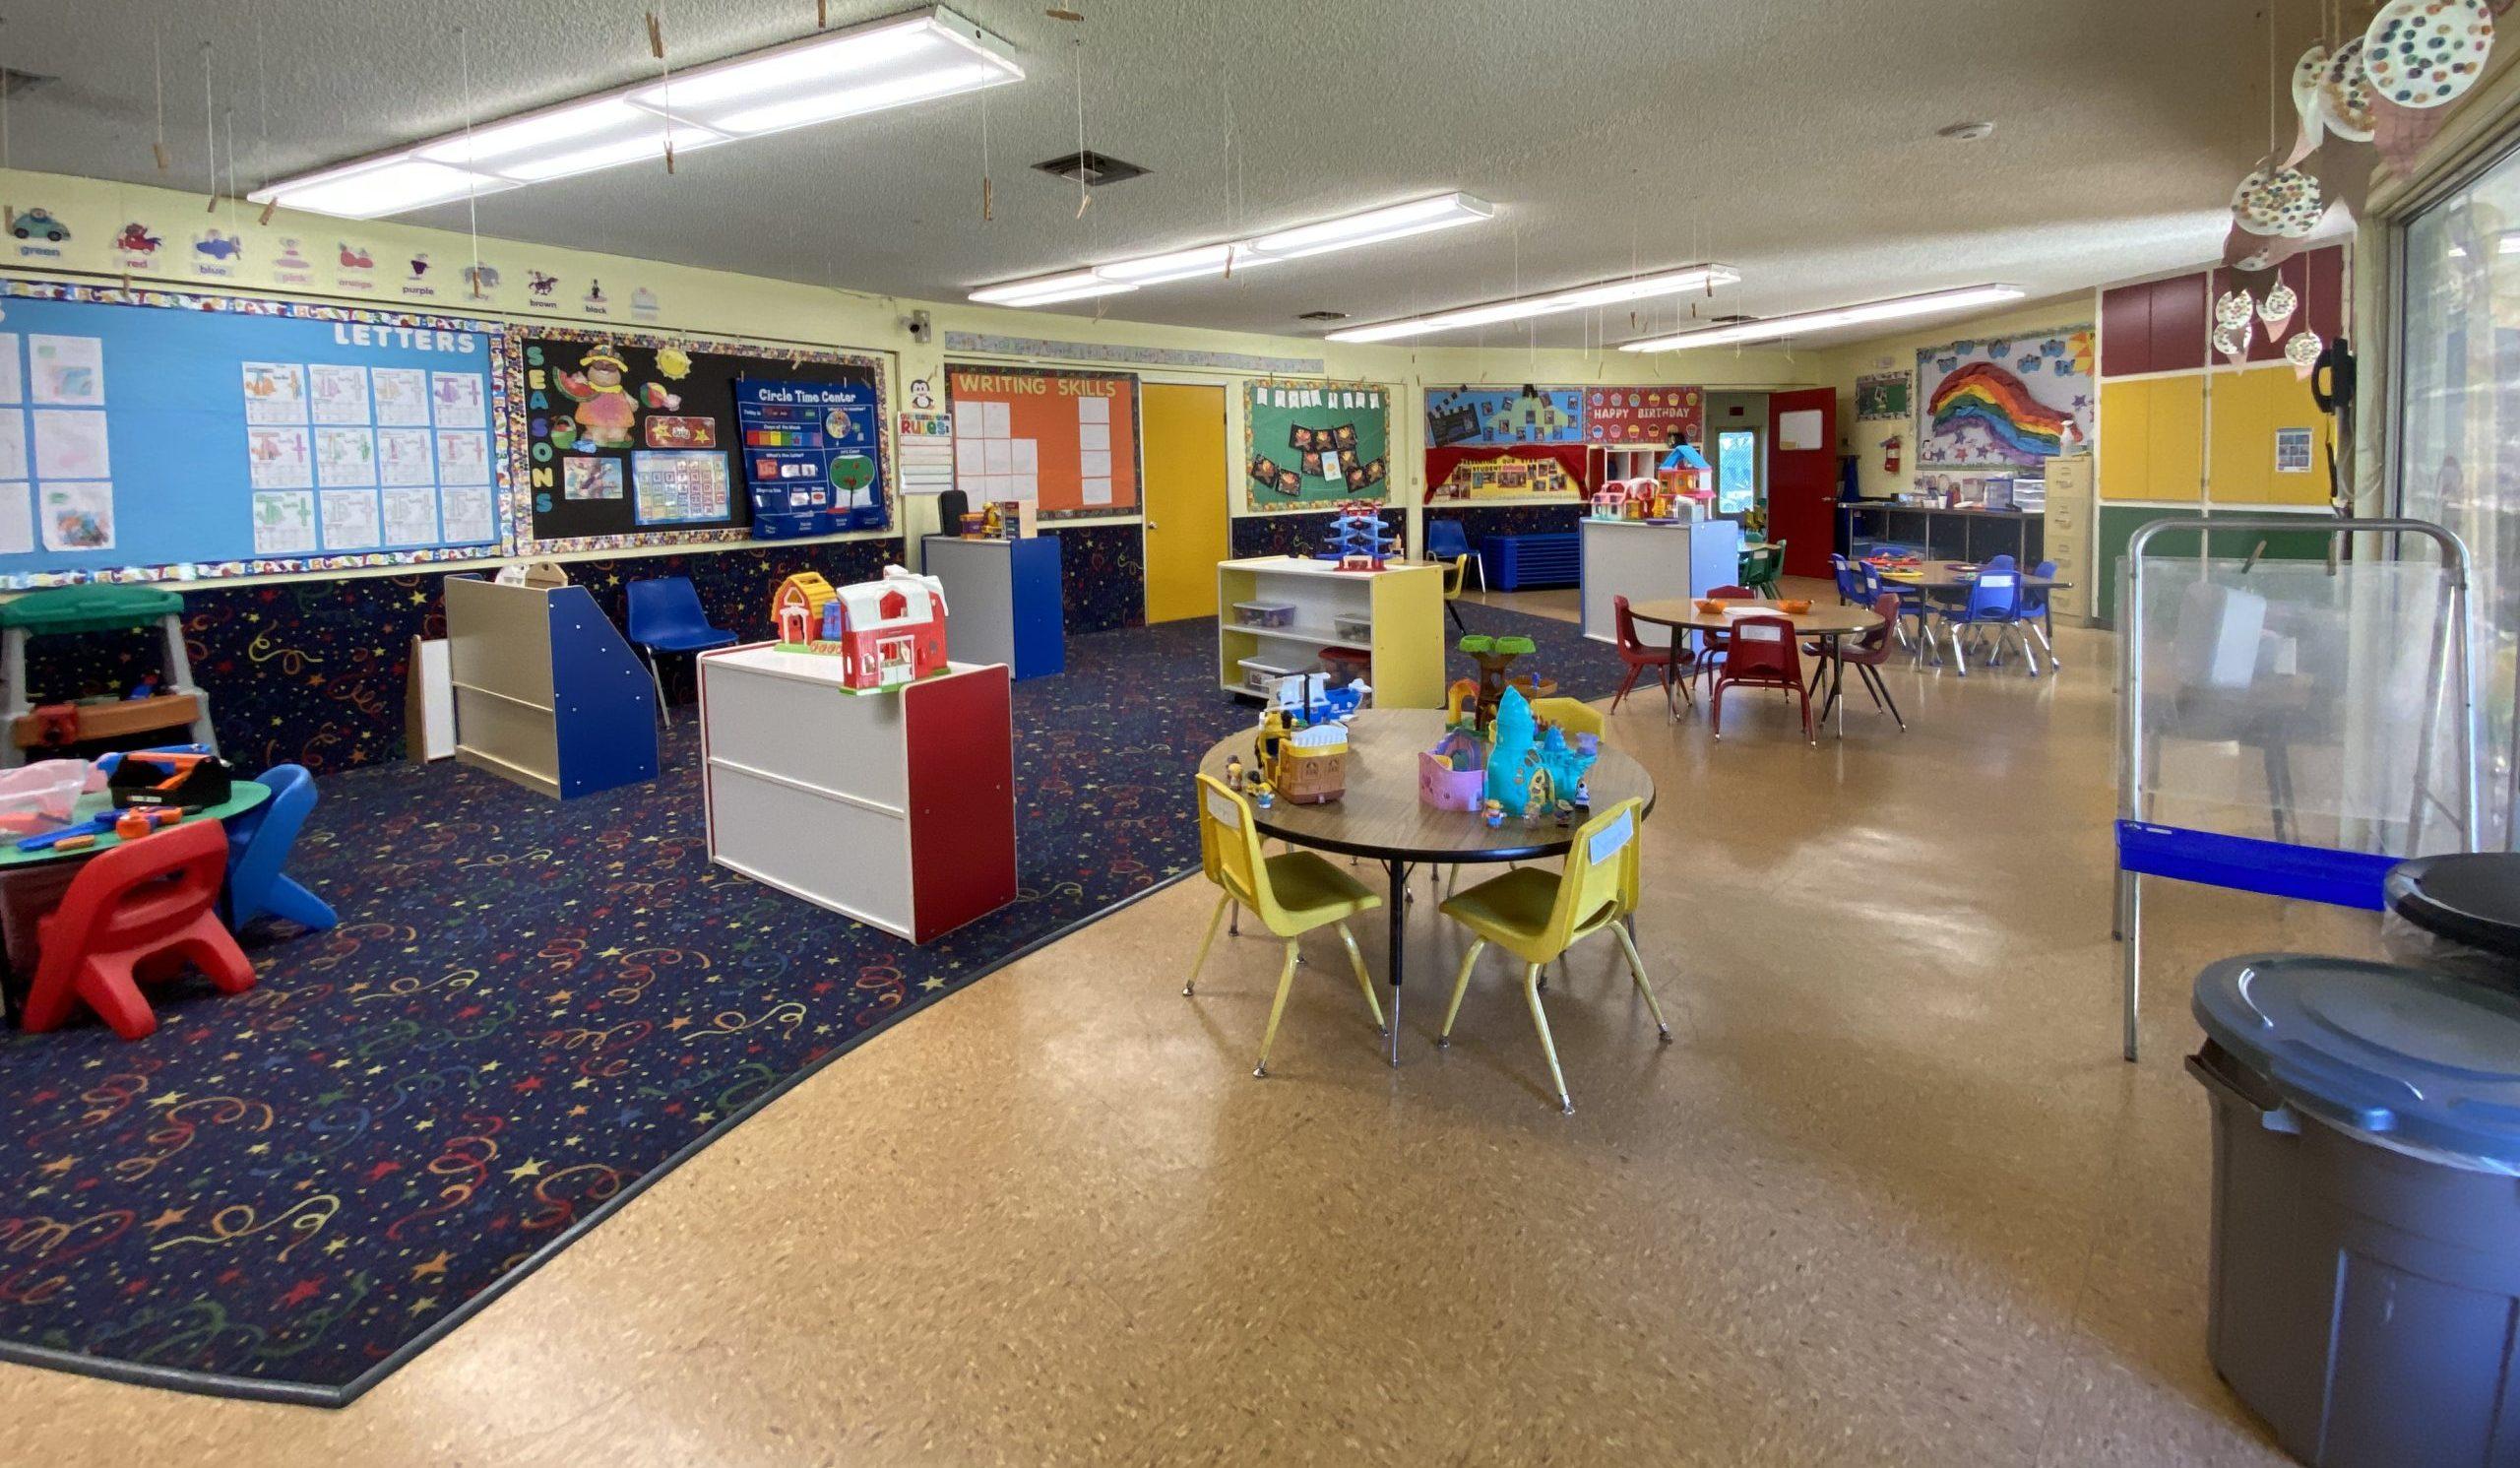 Safe Preschool in Warner Center